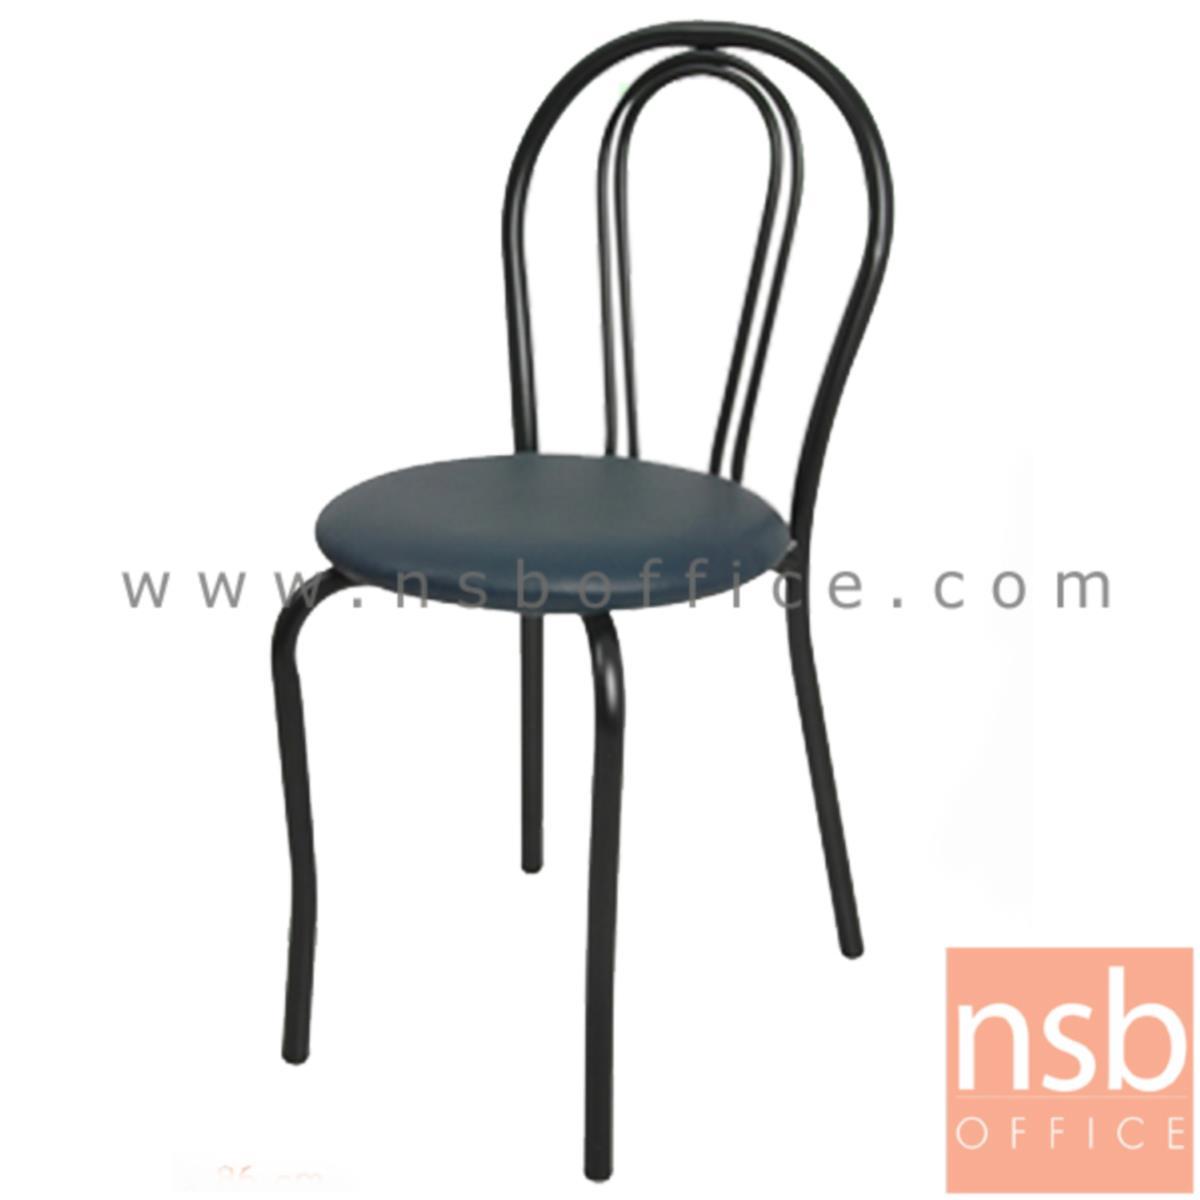 B20A043:เก้าอี้อเนกประสงค์เหล็ก รุ่น FRESHY-BB  ขาเหล็กพ่นดำ